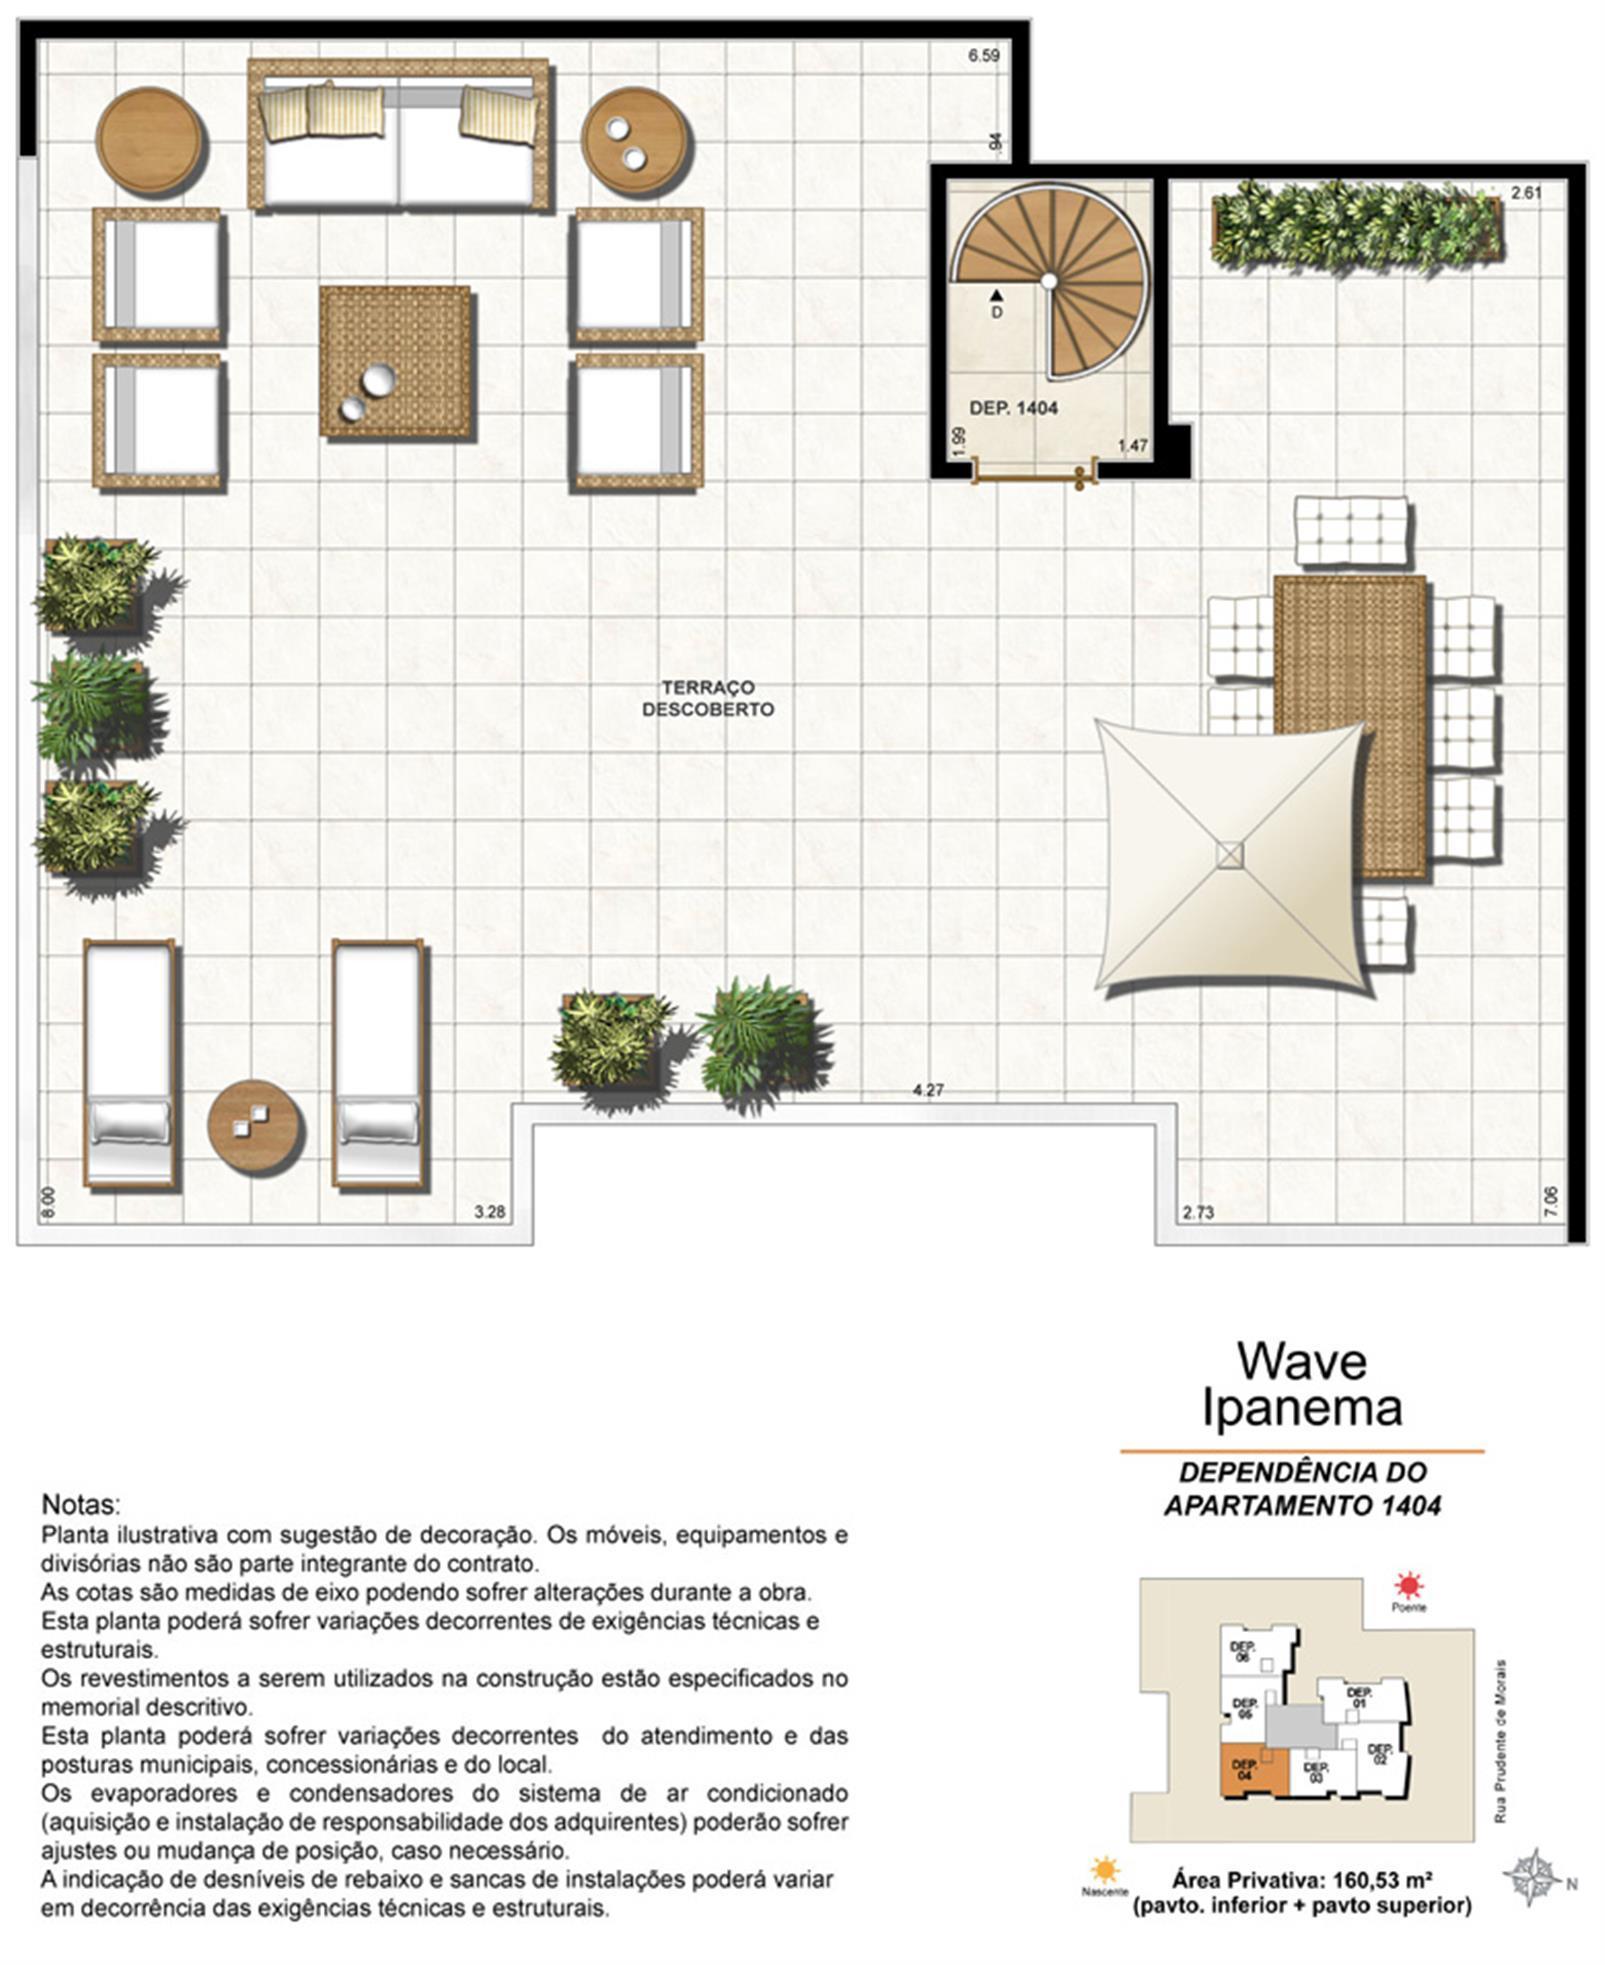 Dependência Cobertura 1404 | Wave Ipanema – Apartamentoem  Ipanema - Rio de Janeiro - Rio de Janeiro